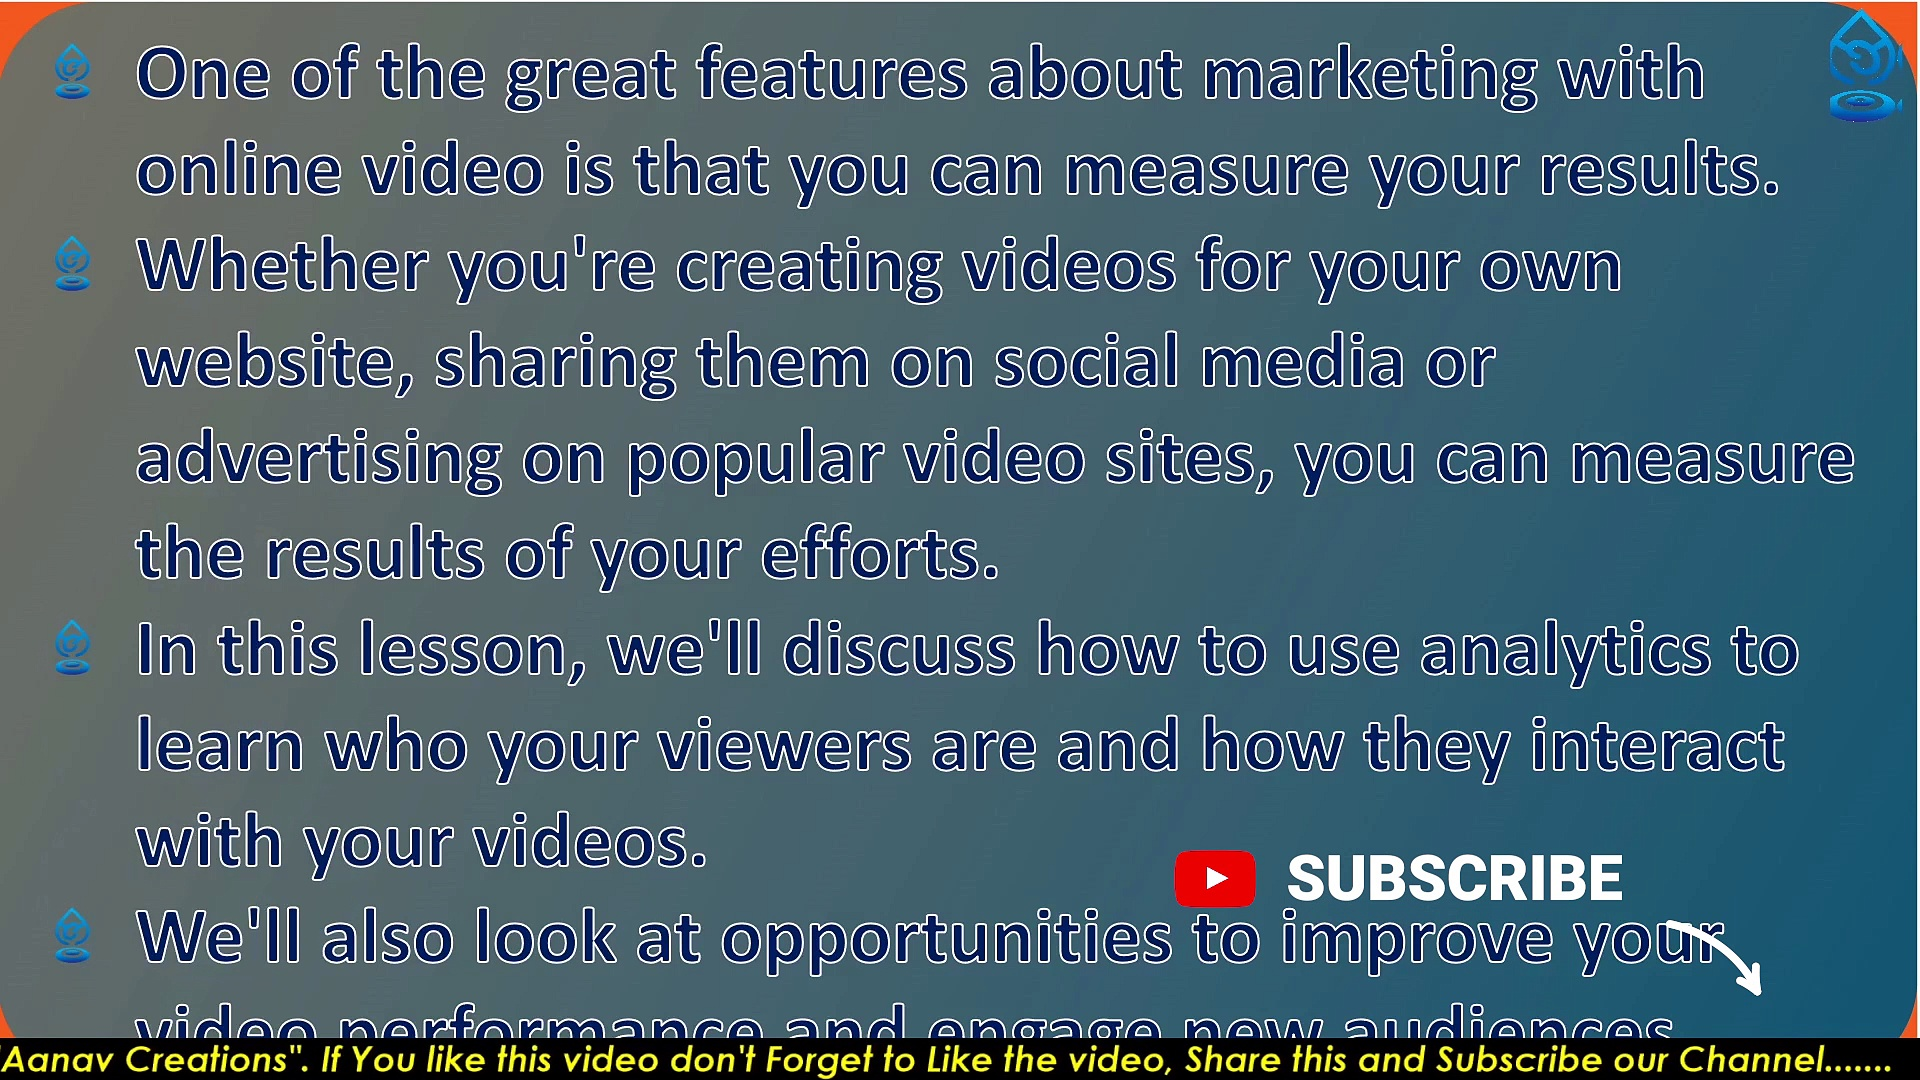 Measuring video performance In Digital Marketing | Video Performance | Class 82 |  @Aanav Creations   @Technical Maanav